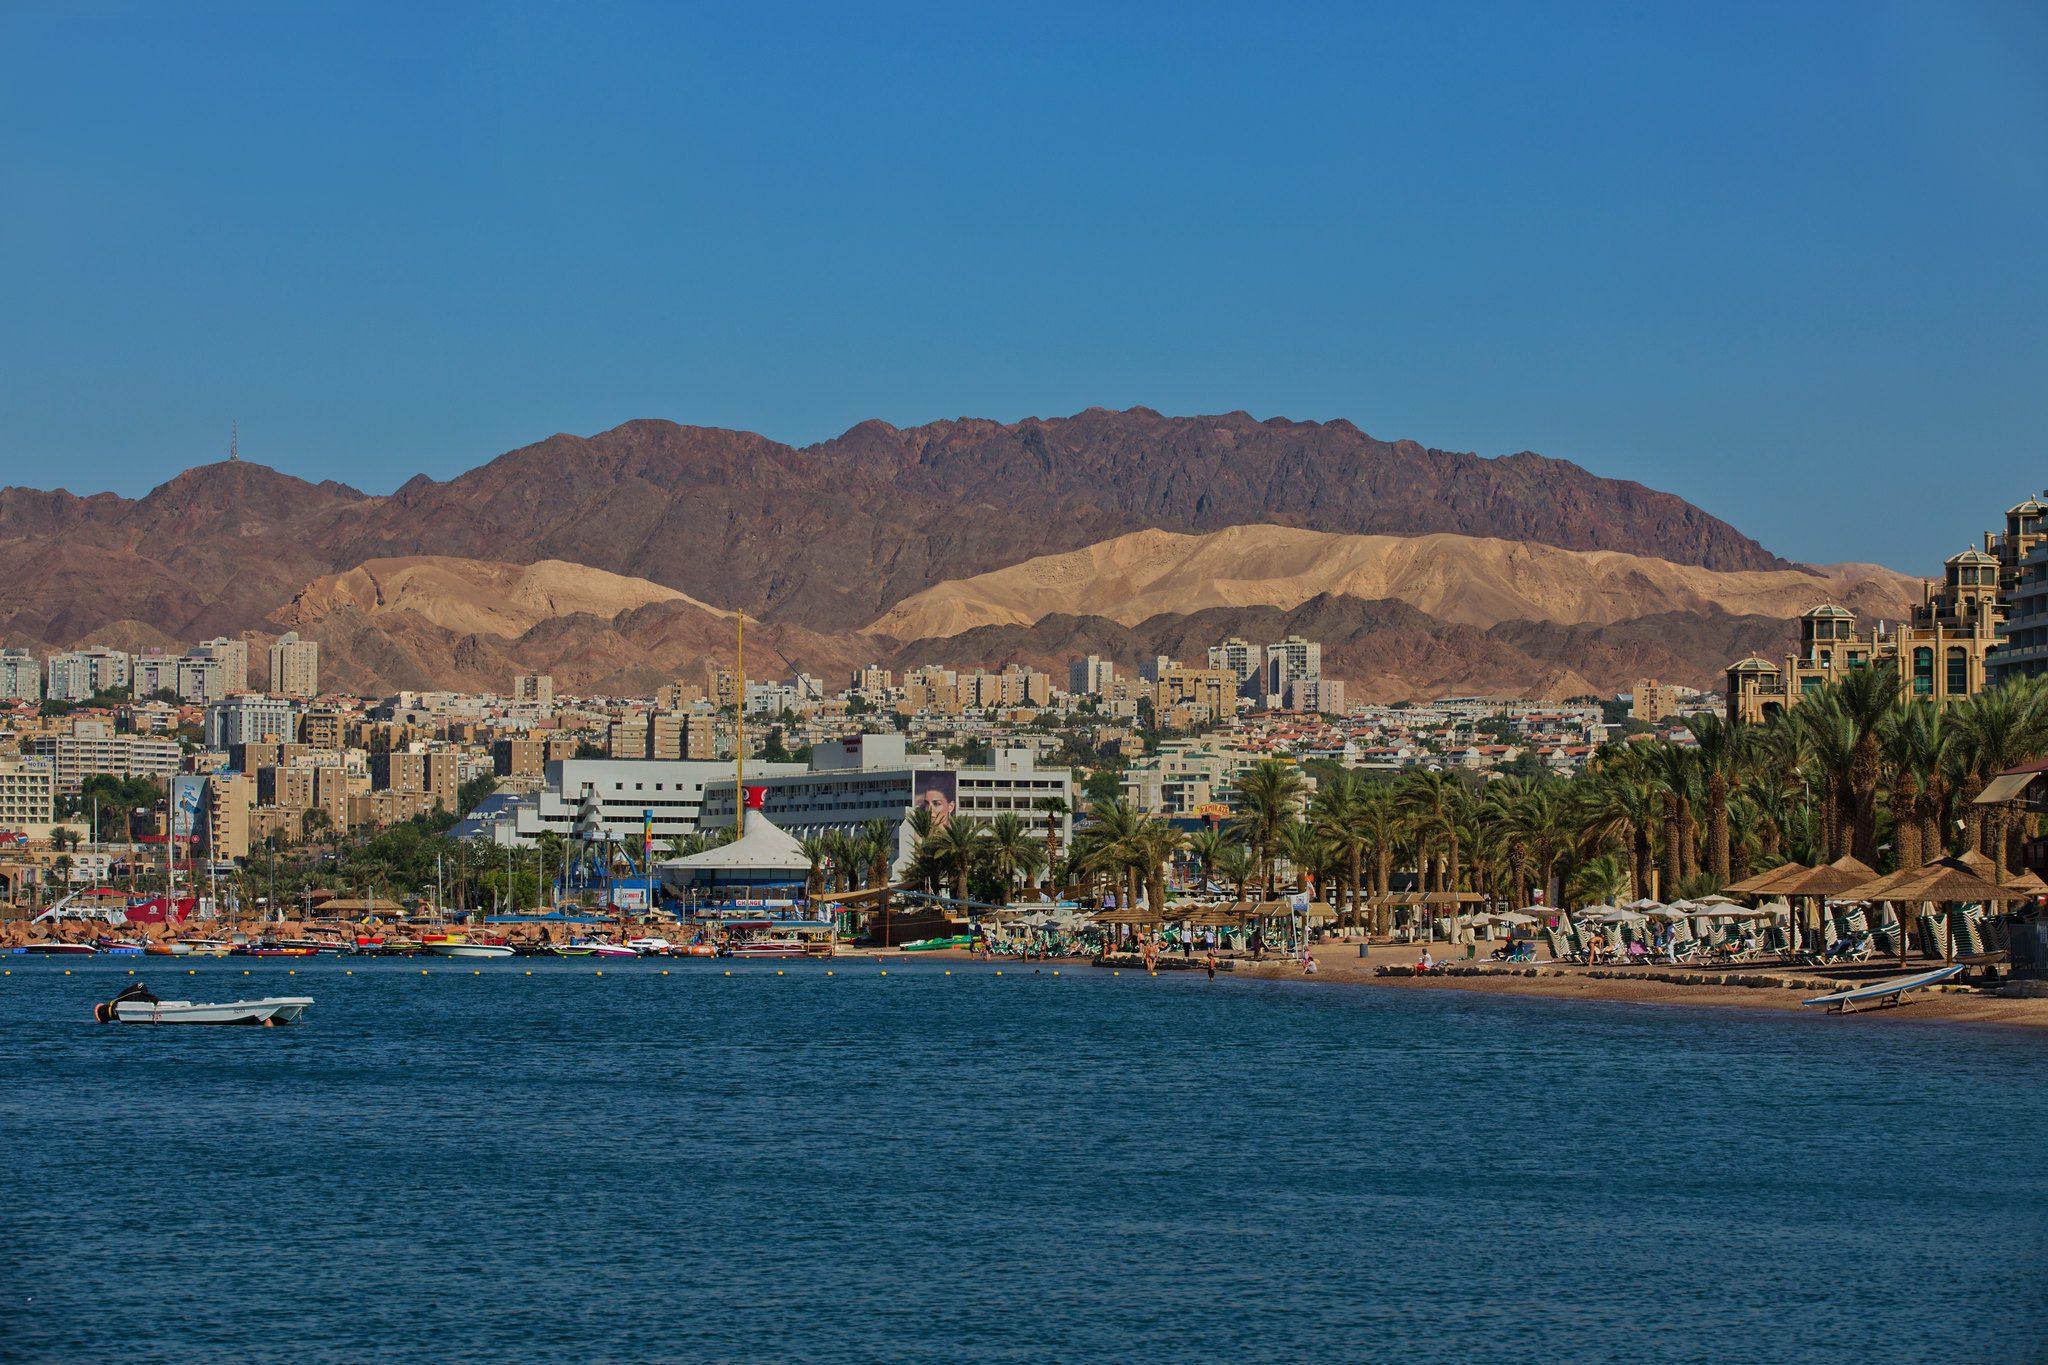 Eilat resort area on Red Sea